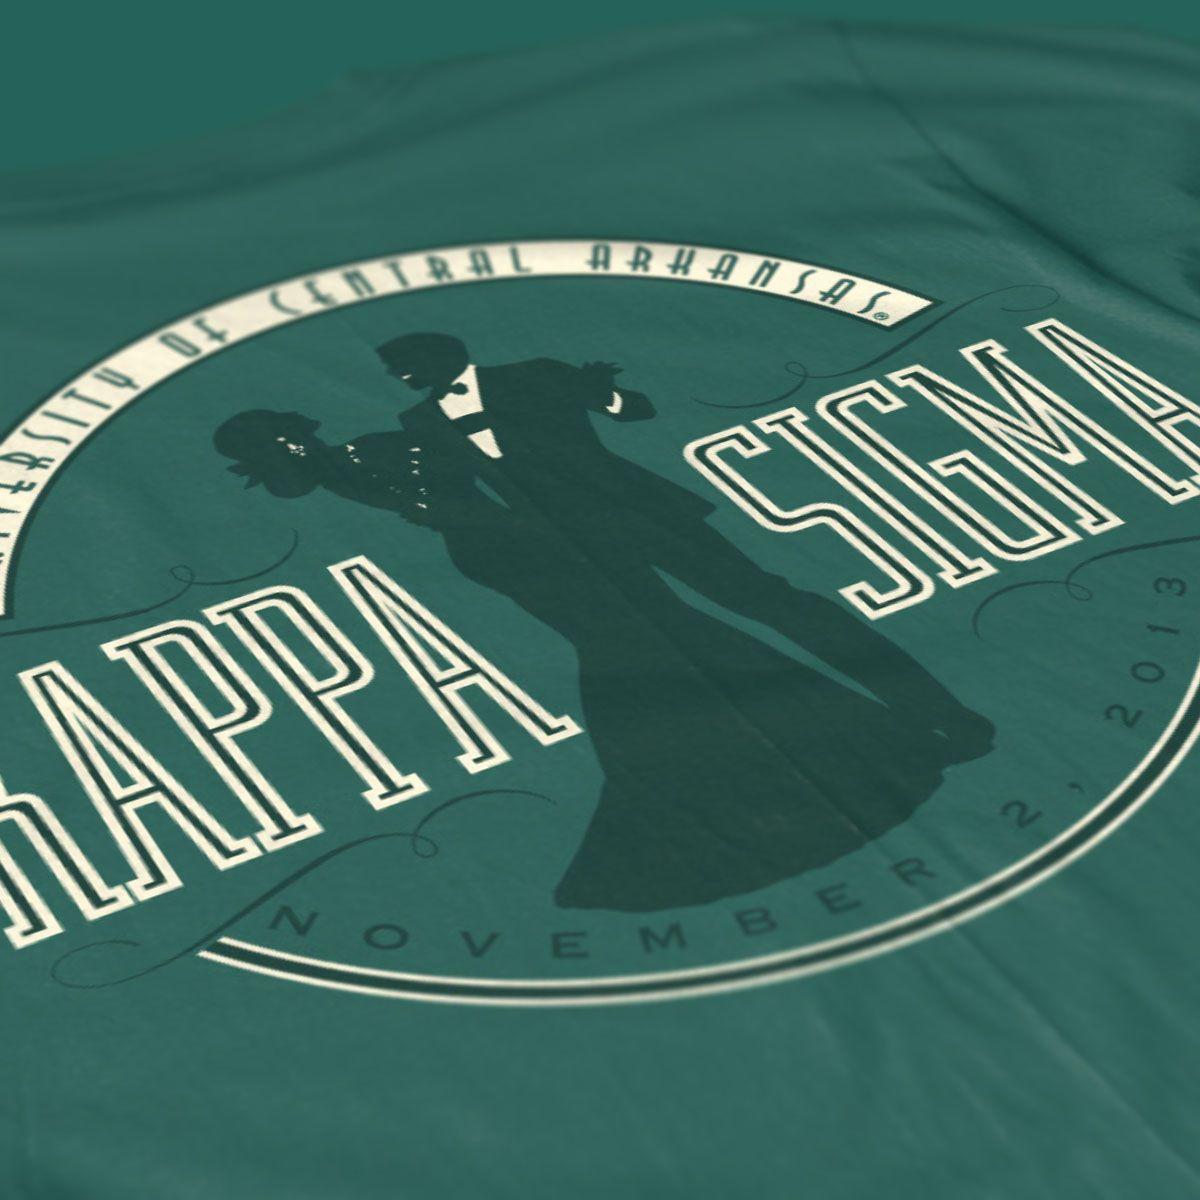 Shirt ke design - Kappa Sigma Ke Semi Formal Design University Of Central Arkansas Kappa Sig